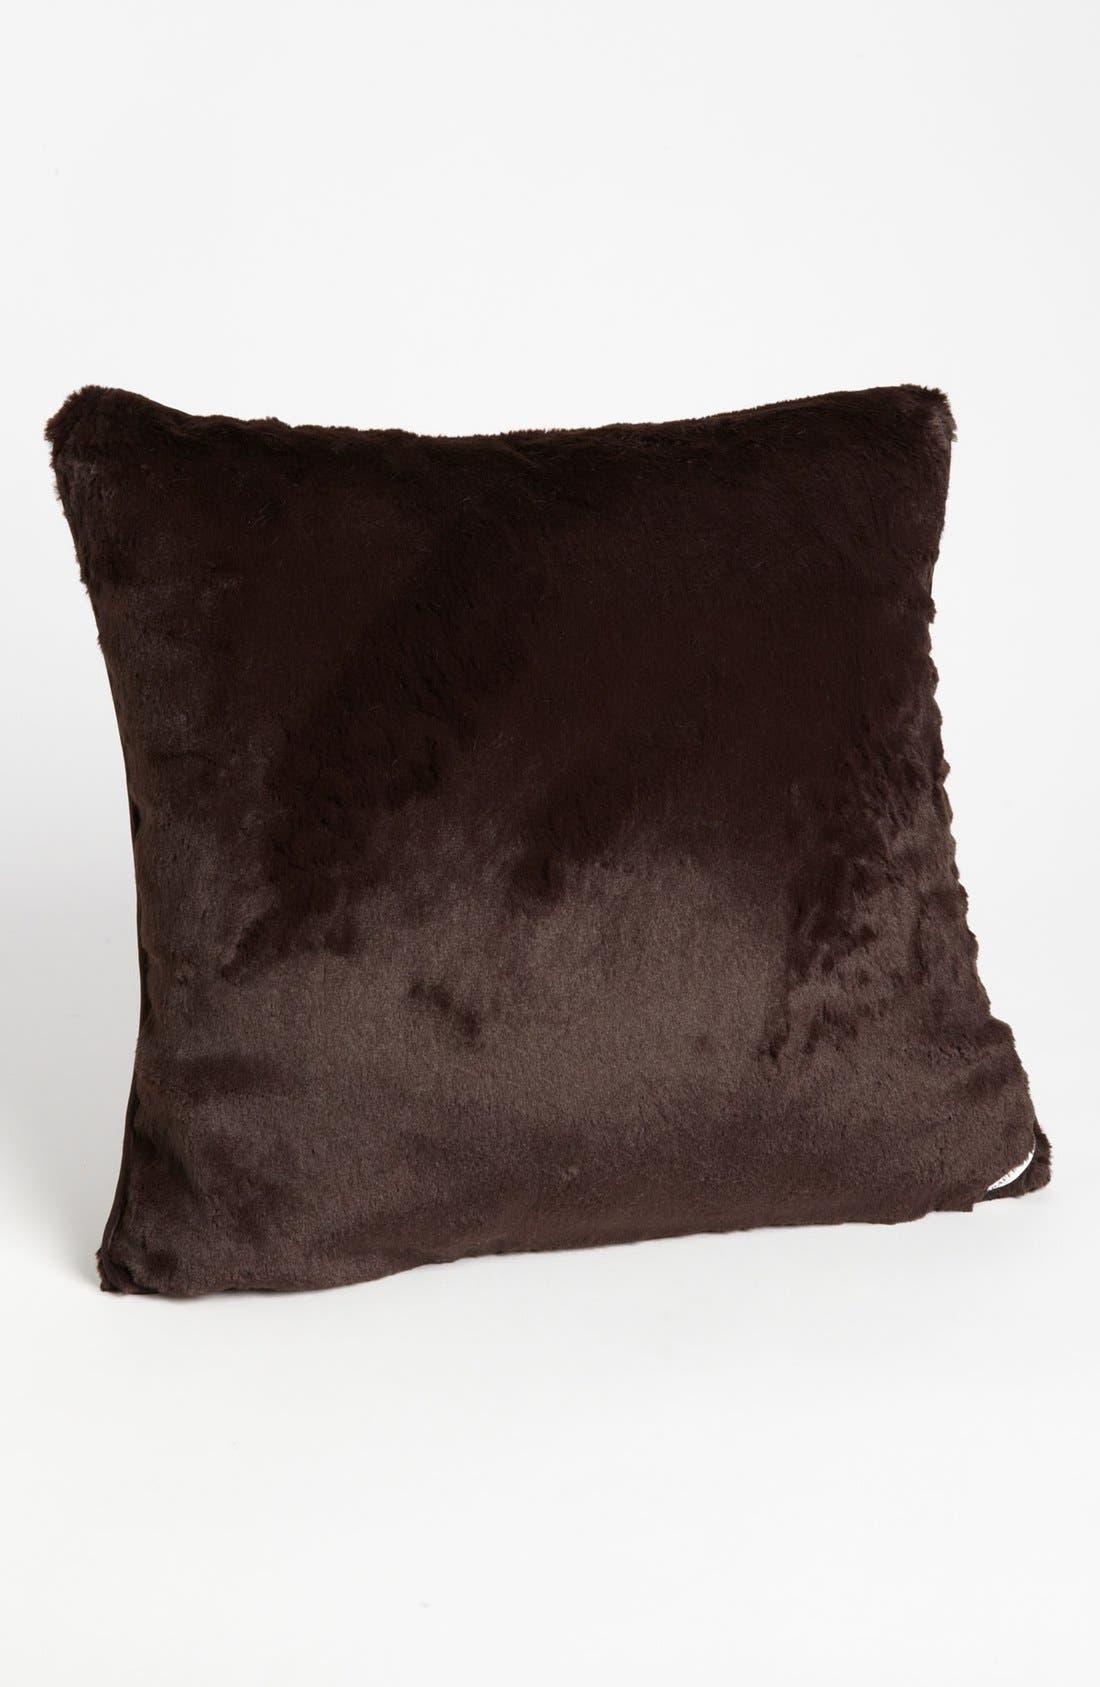 Giraffe at Home 'Luxe' Throw Pillow (Online Only)